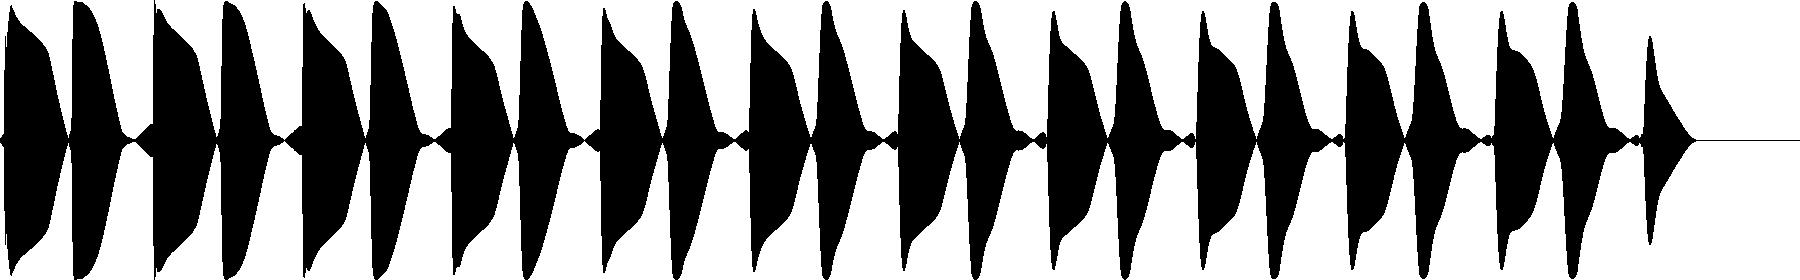 vedh bass cut 108 g